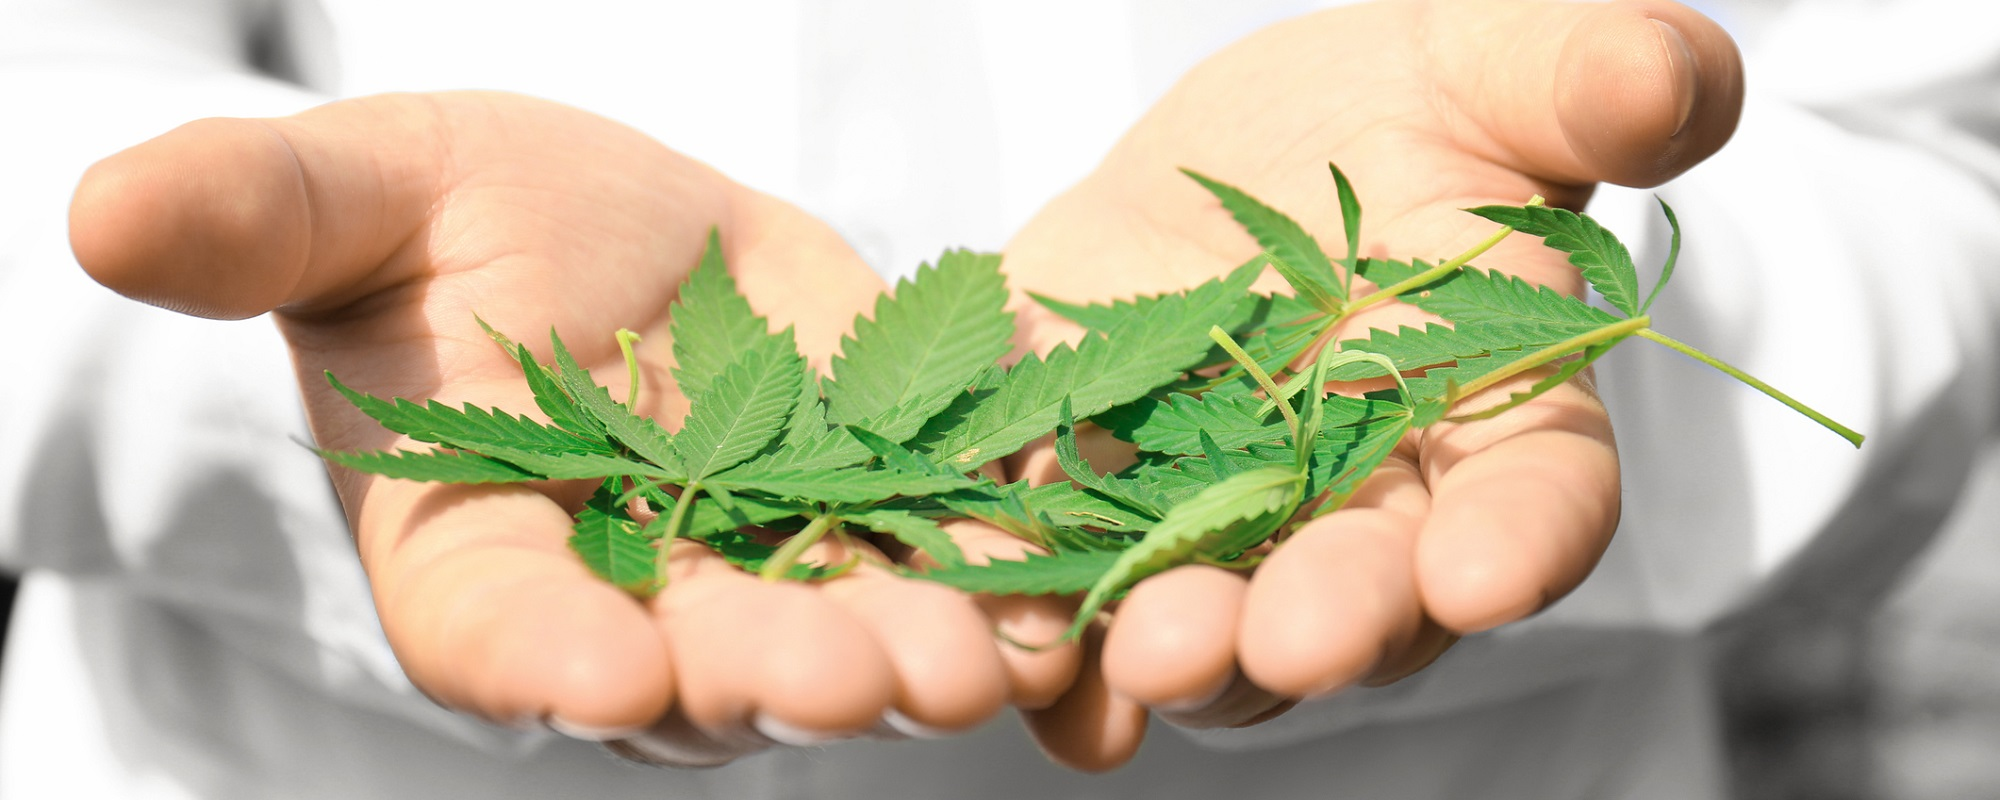 Hemp versus Marijuana: CBD vs THC